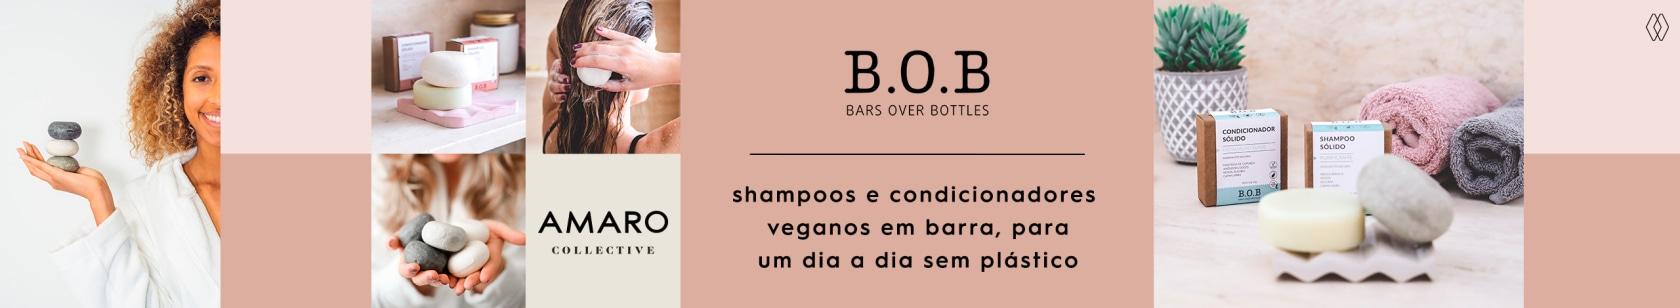 B.O.B BARS | AMARO COLLECTIVE